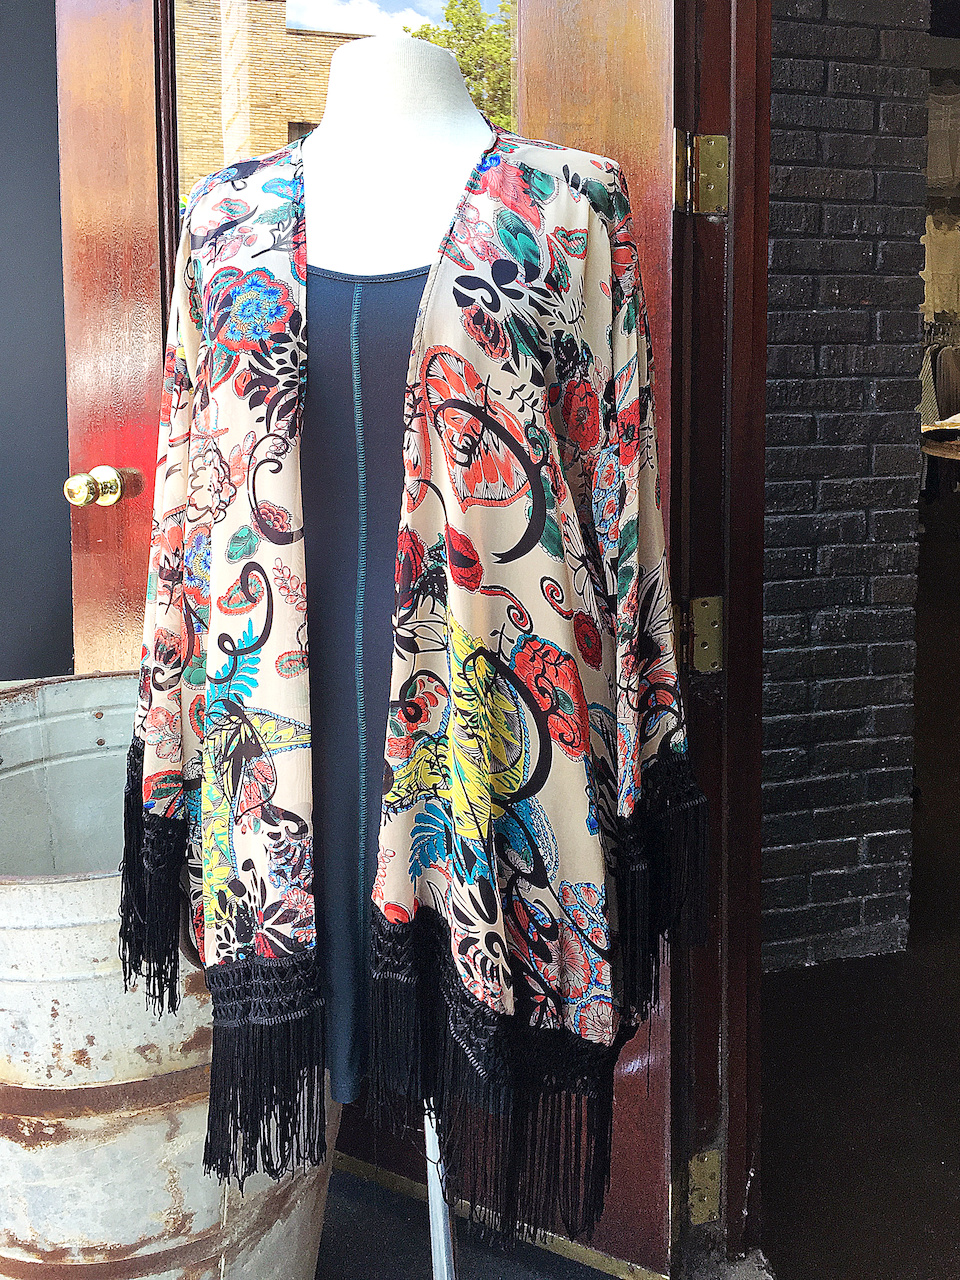 From Ambiance: Multiprint fringe kimono, $44; teal tank dress, $39